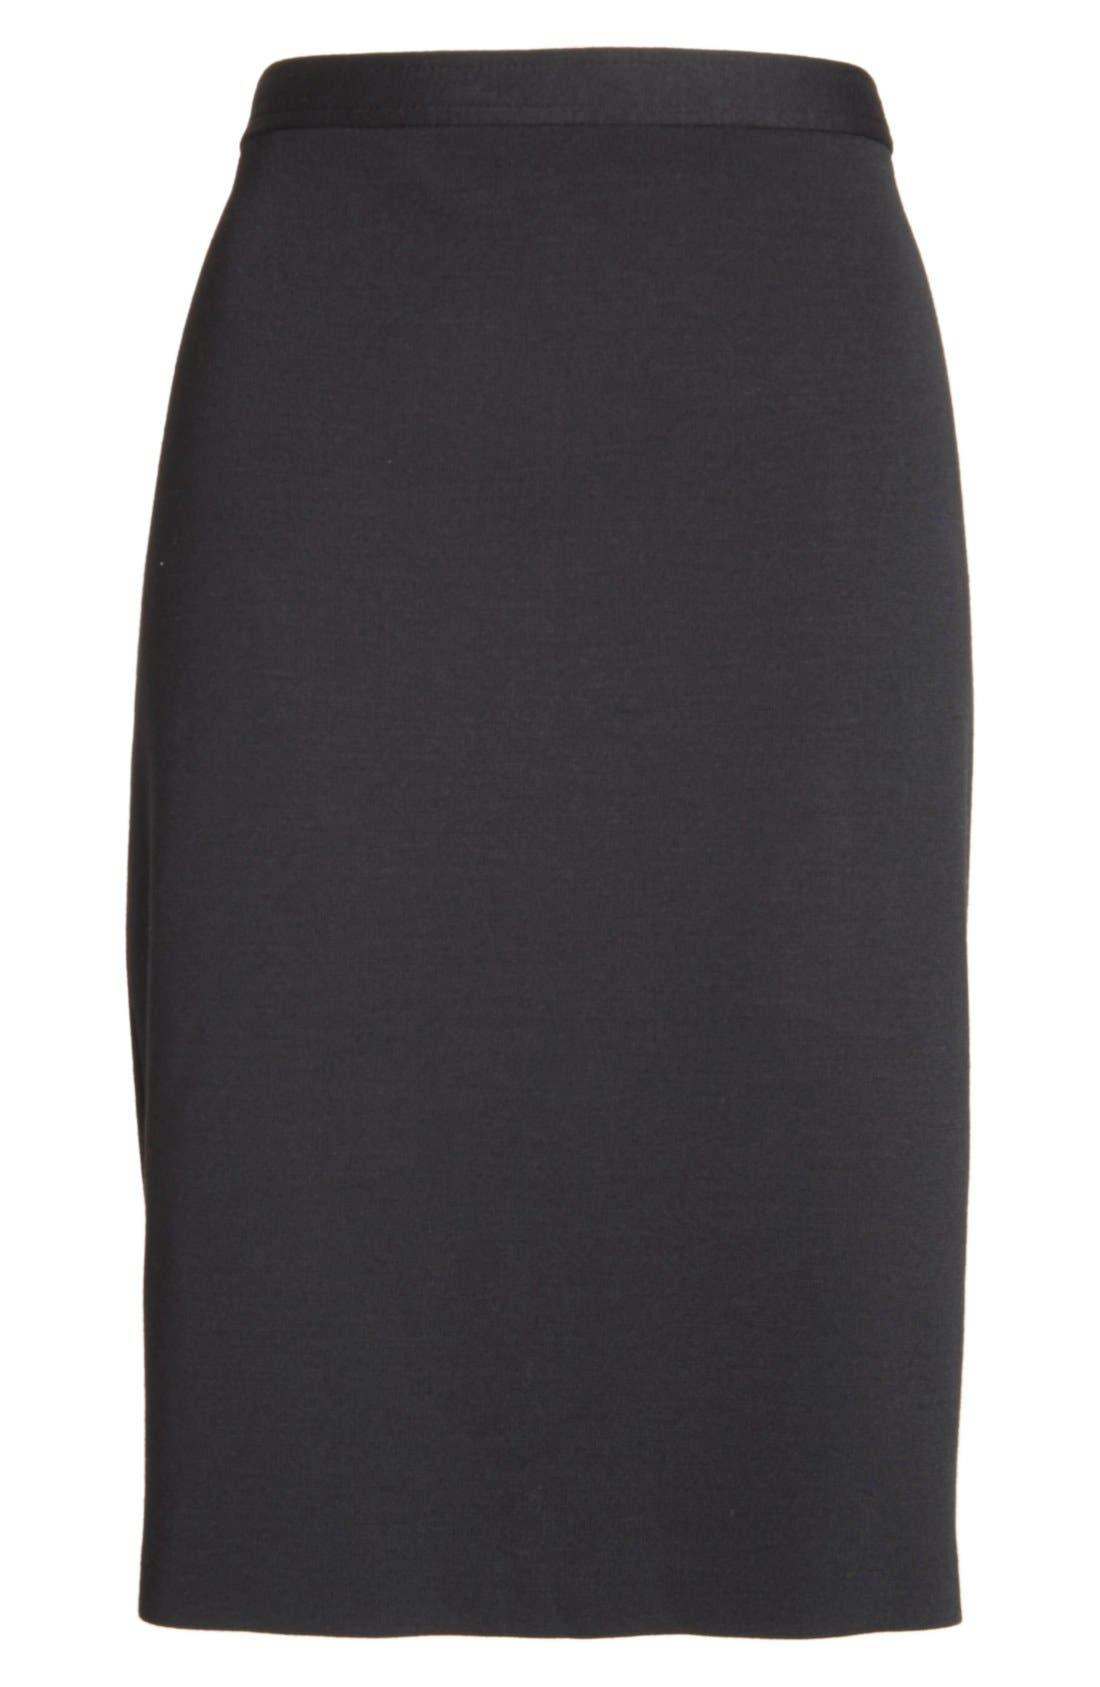 Alternate Image 4  - St. John Collection Milano Knit Pencil Skirt